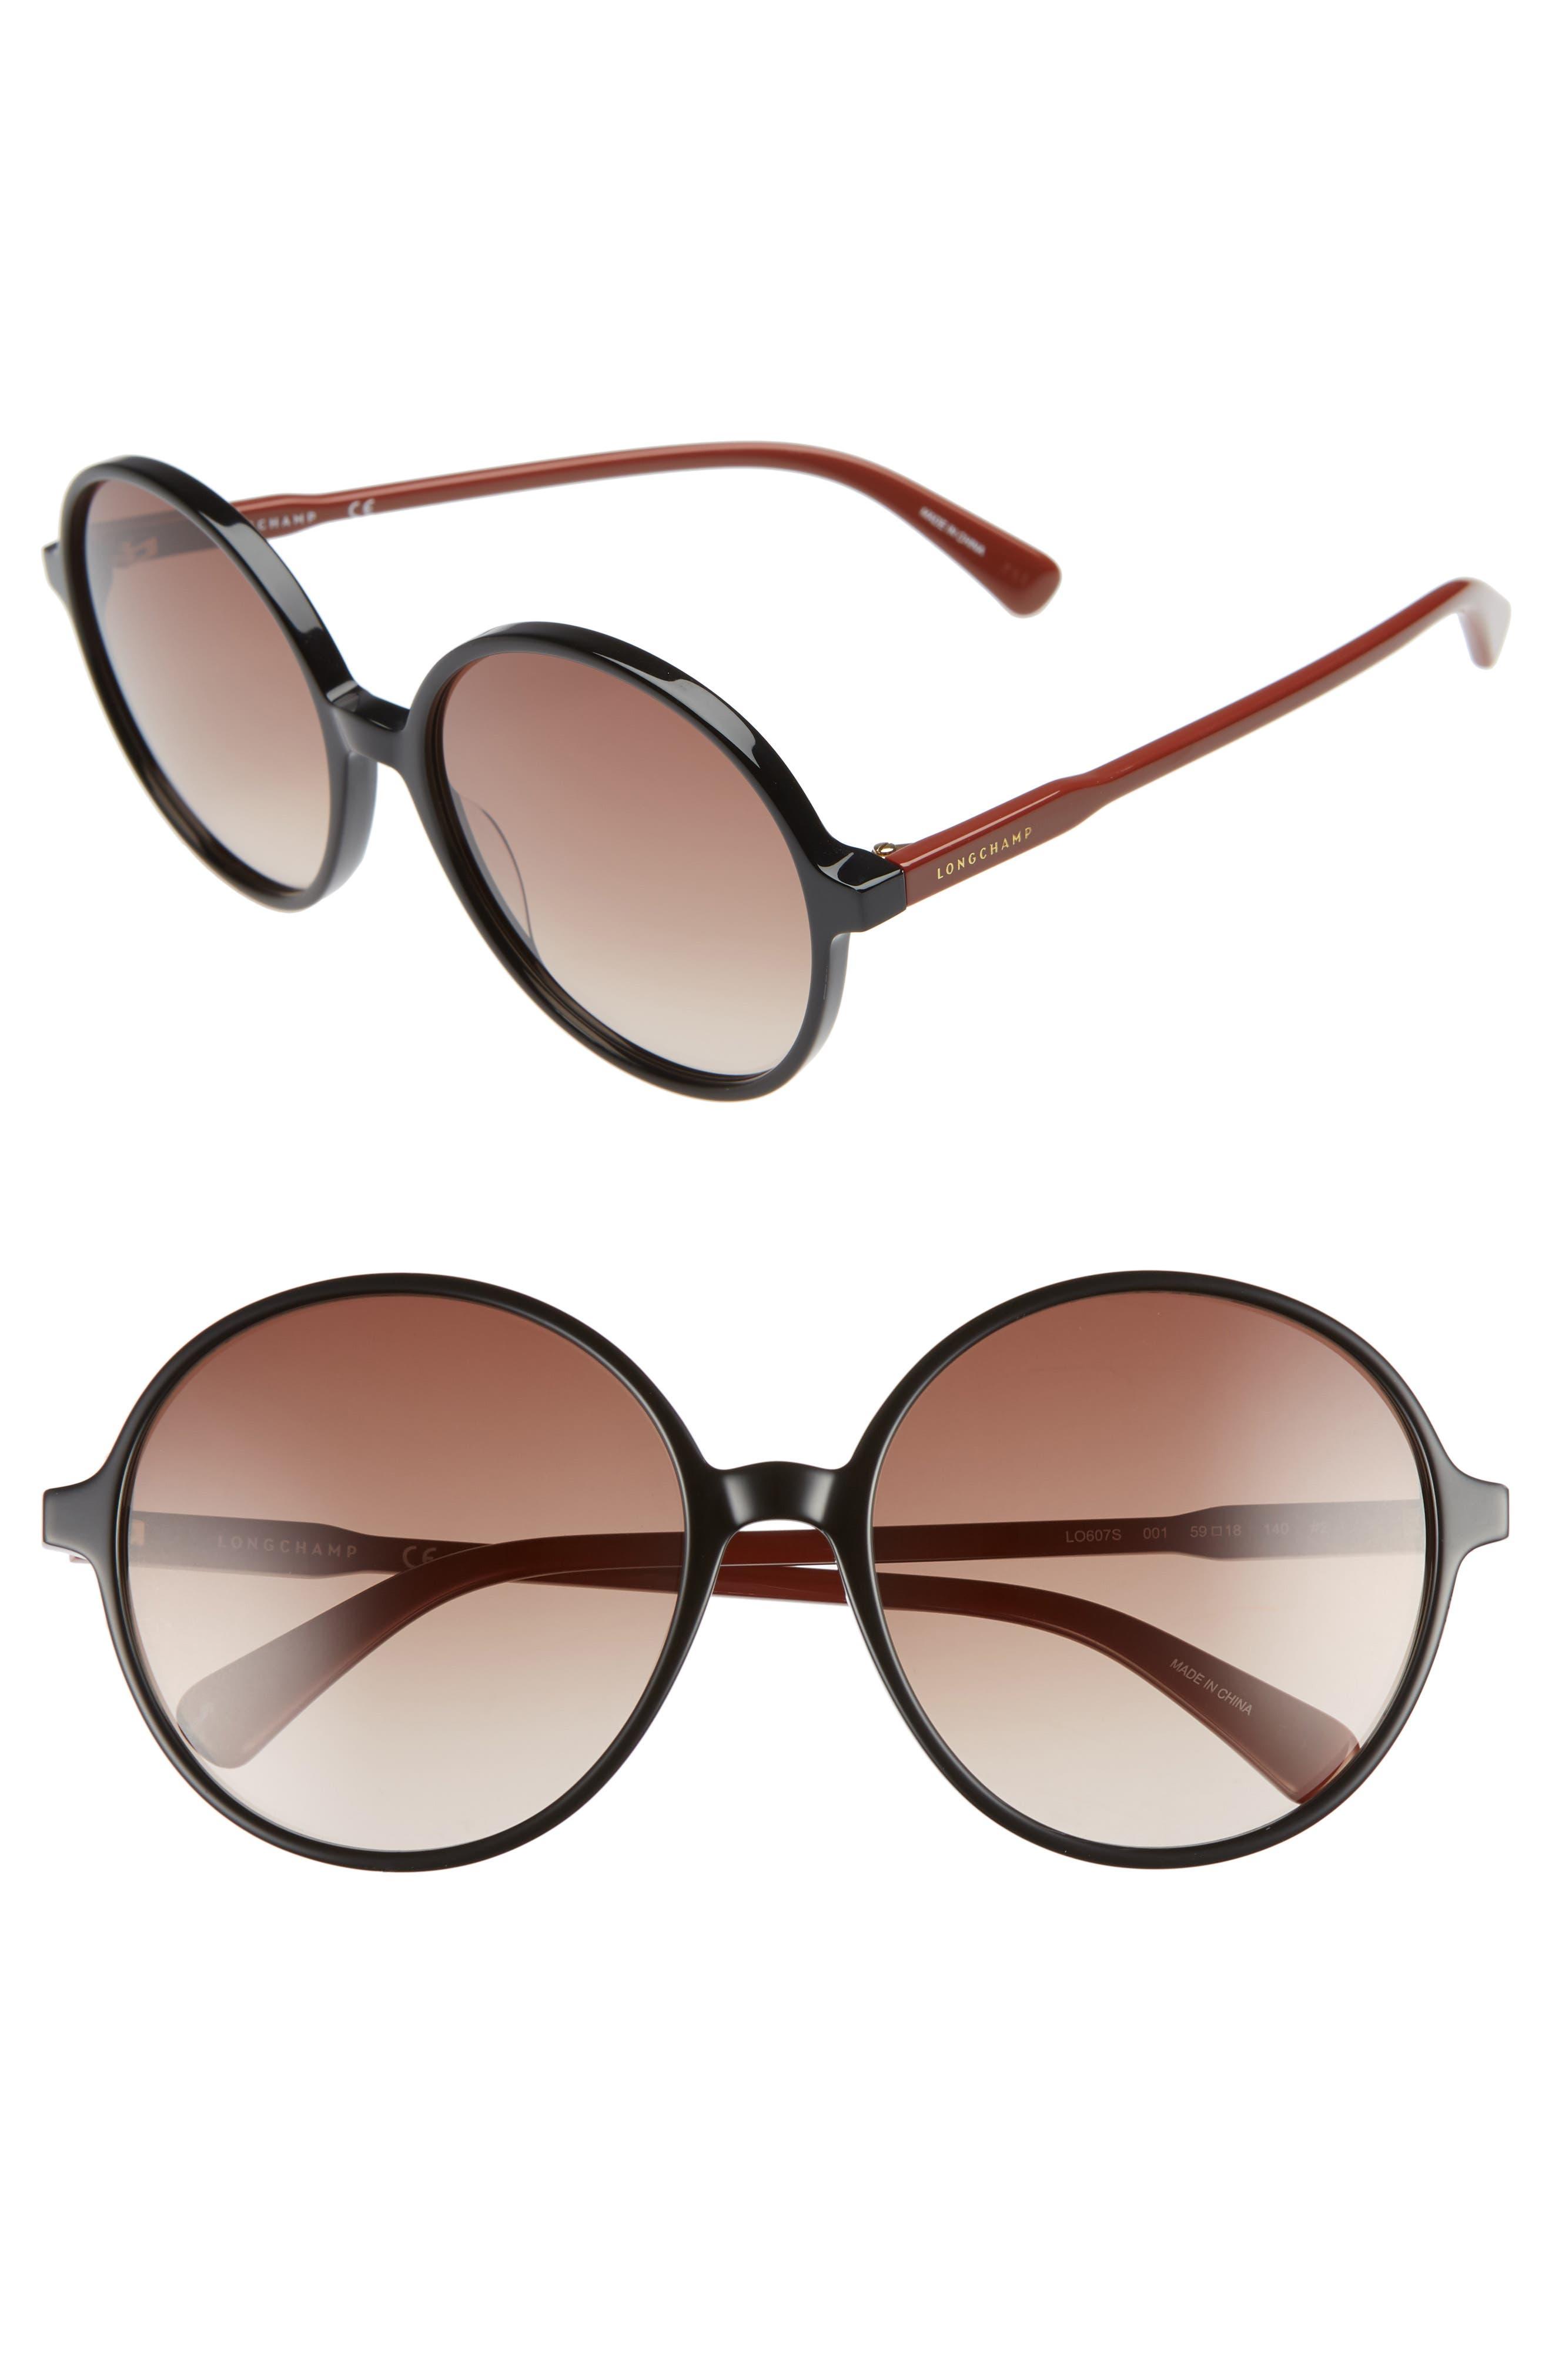 49mm Gradient Round Sunglasses,                             Main thumbnail 1, color,                             BLACK